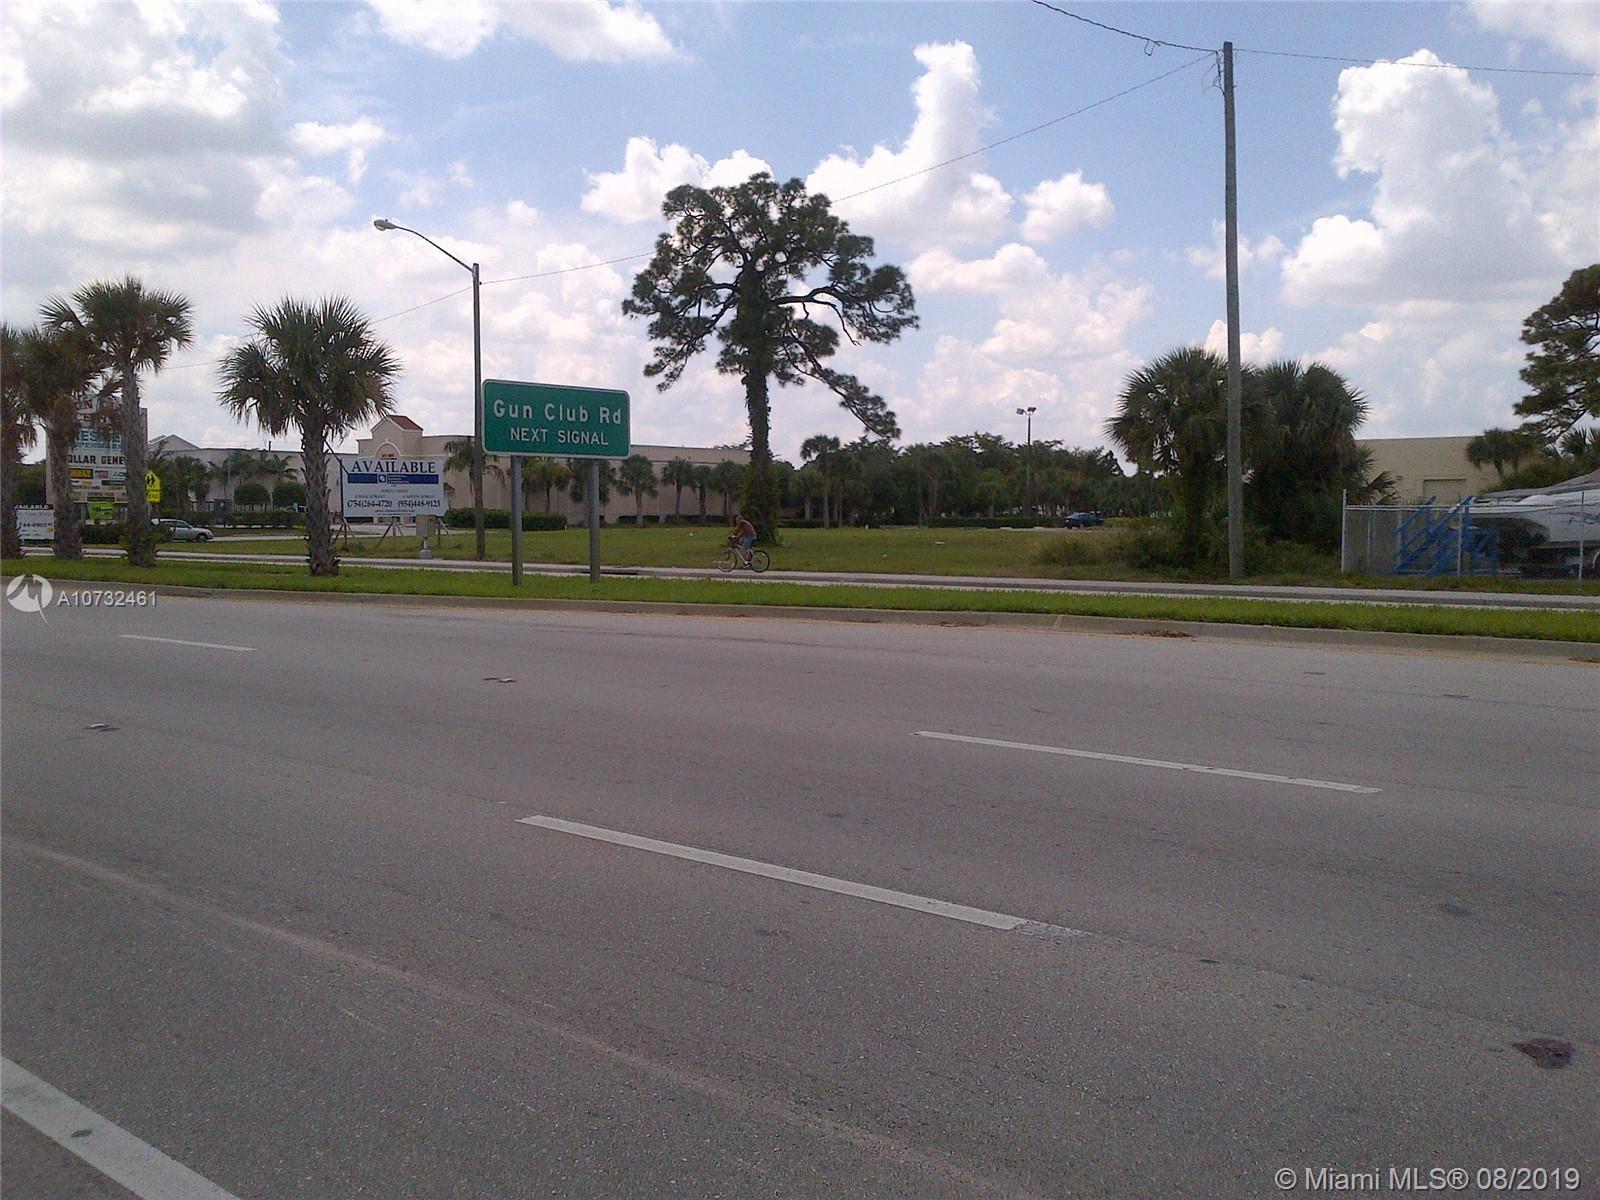 181 Military Trl, West Palm Beach, Florida 33415